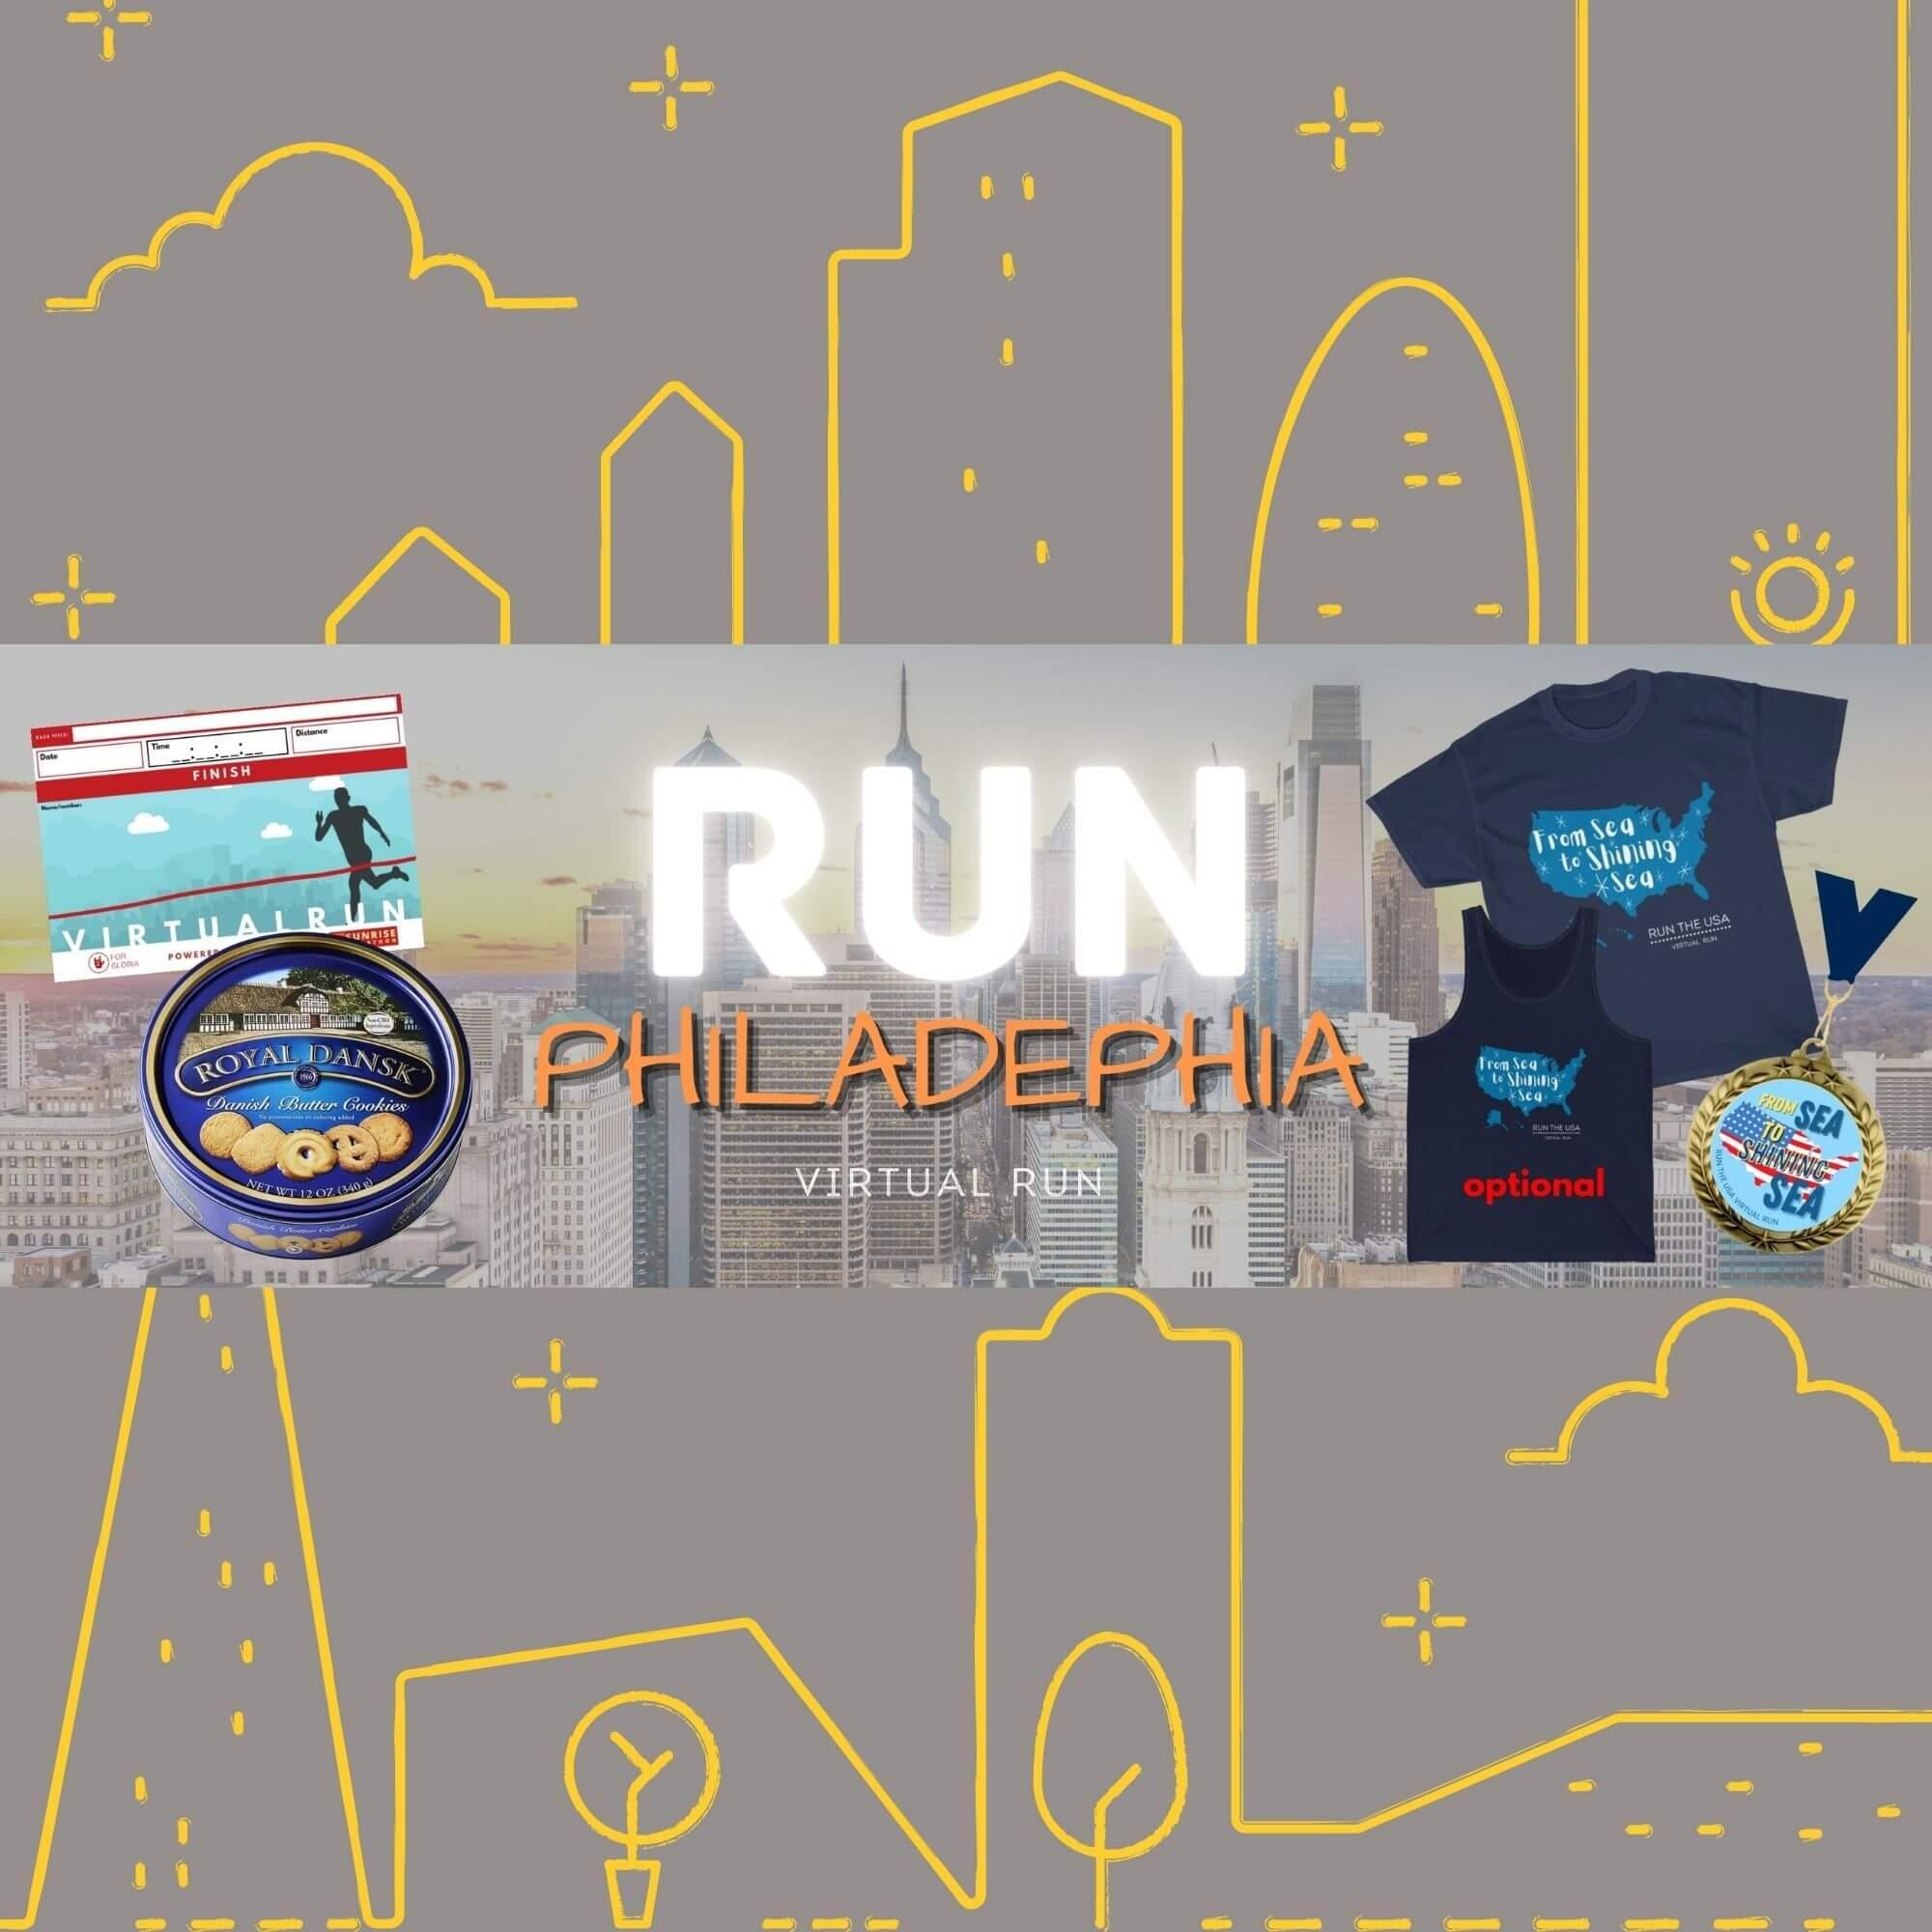 Run Philadelphia